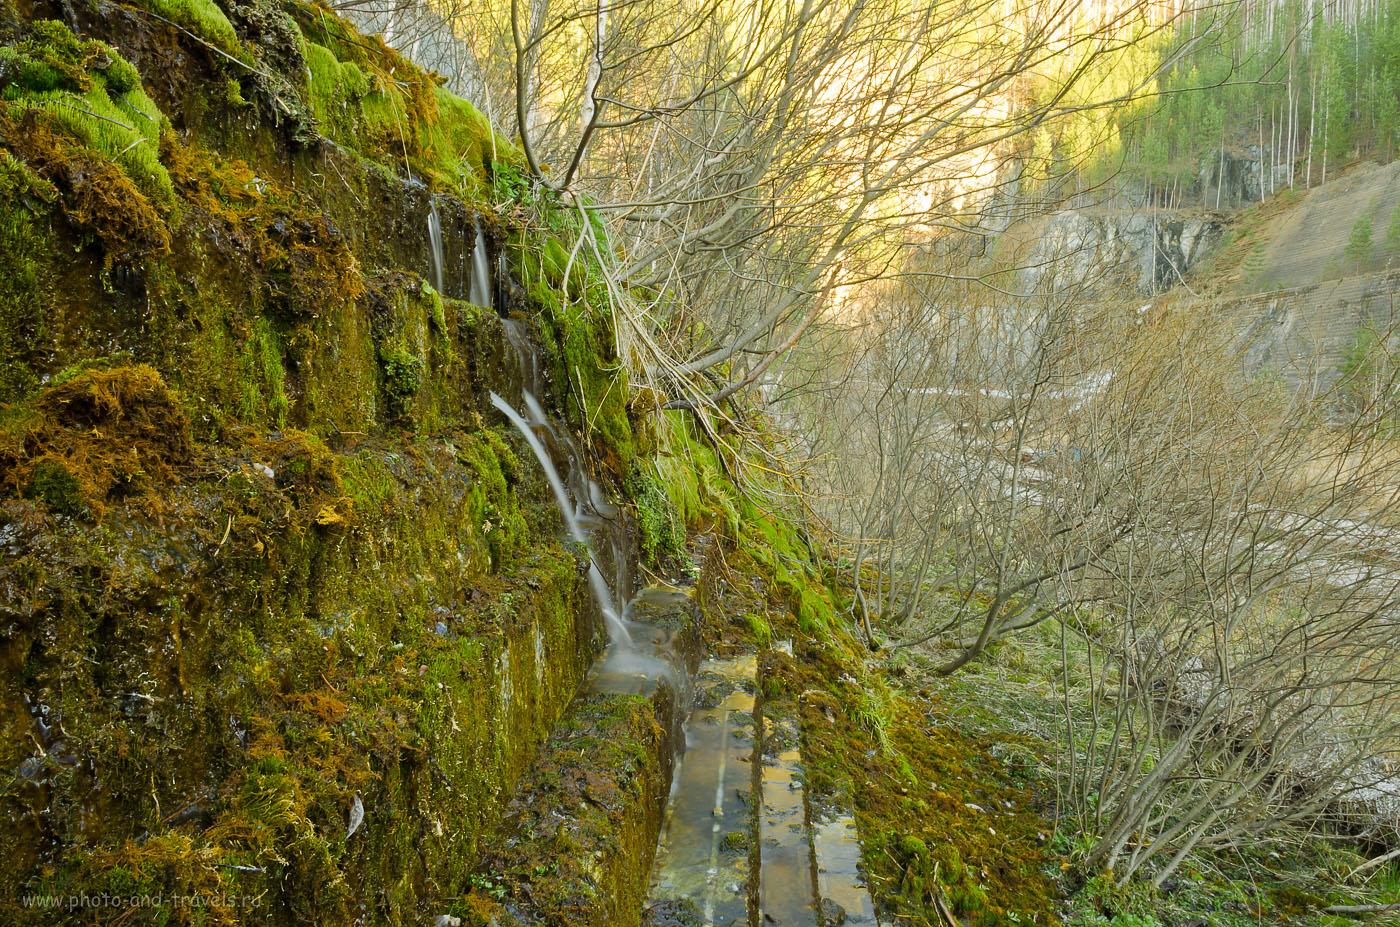 18. Водопад на стенах каменоломни Старая линза.